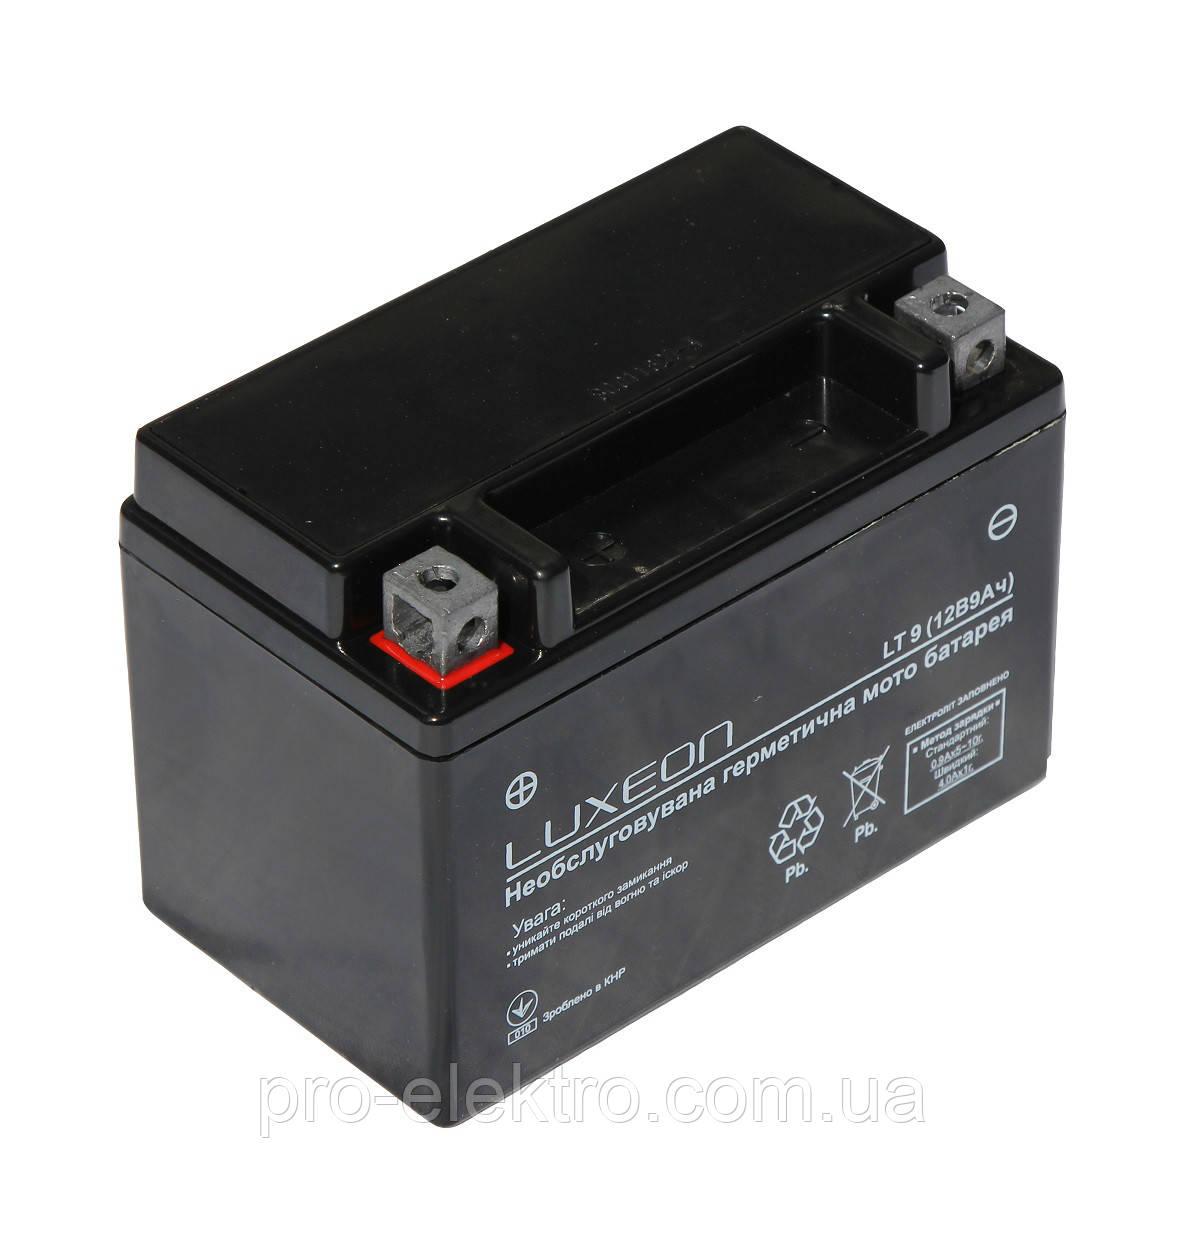 Аккумуляторная батарея LUXEON LT 9